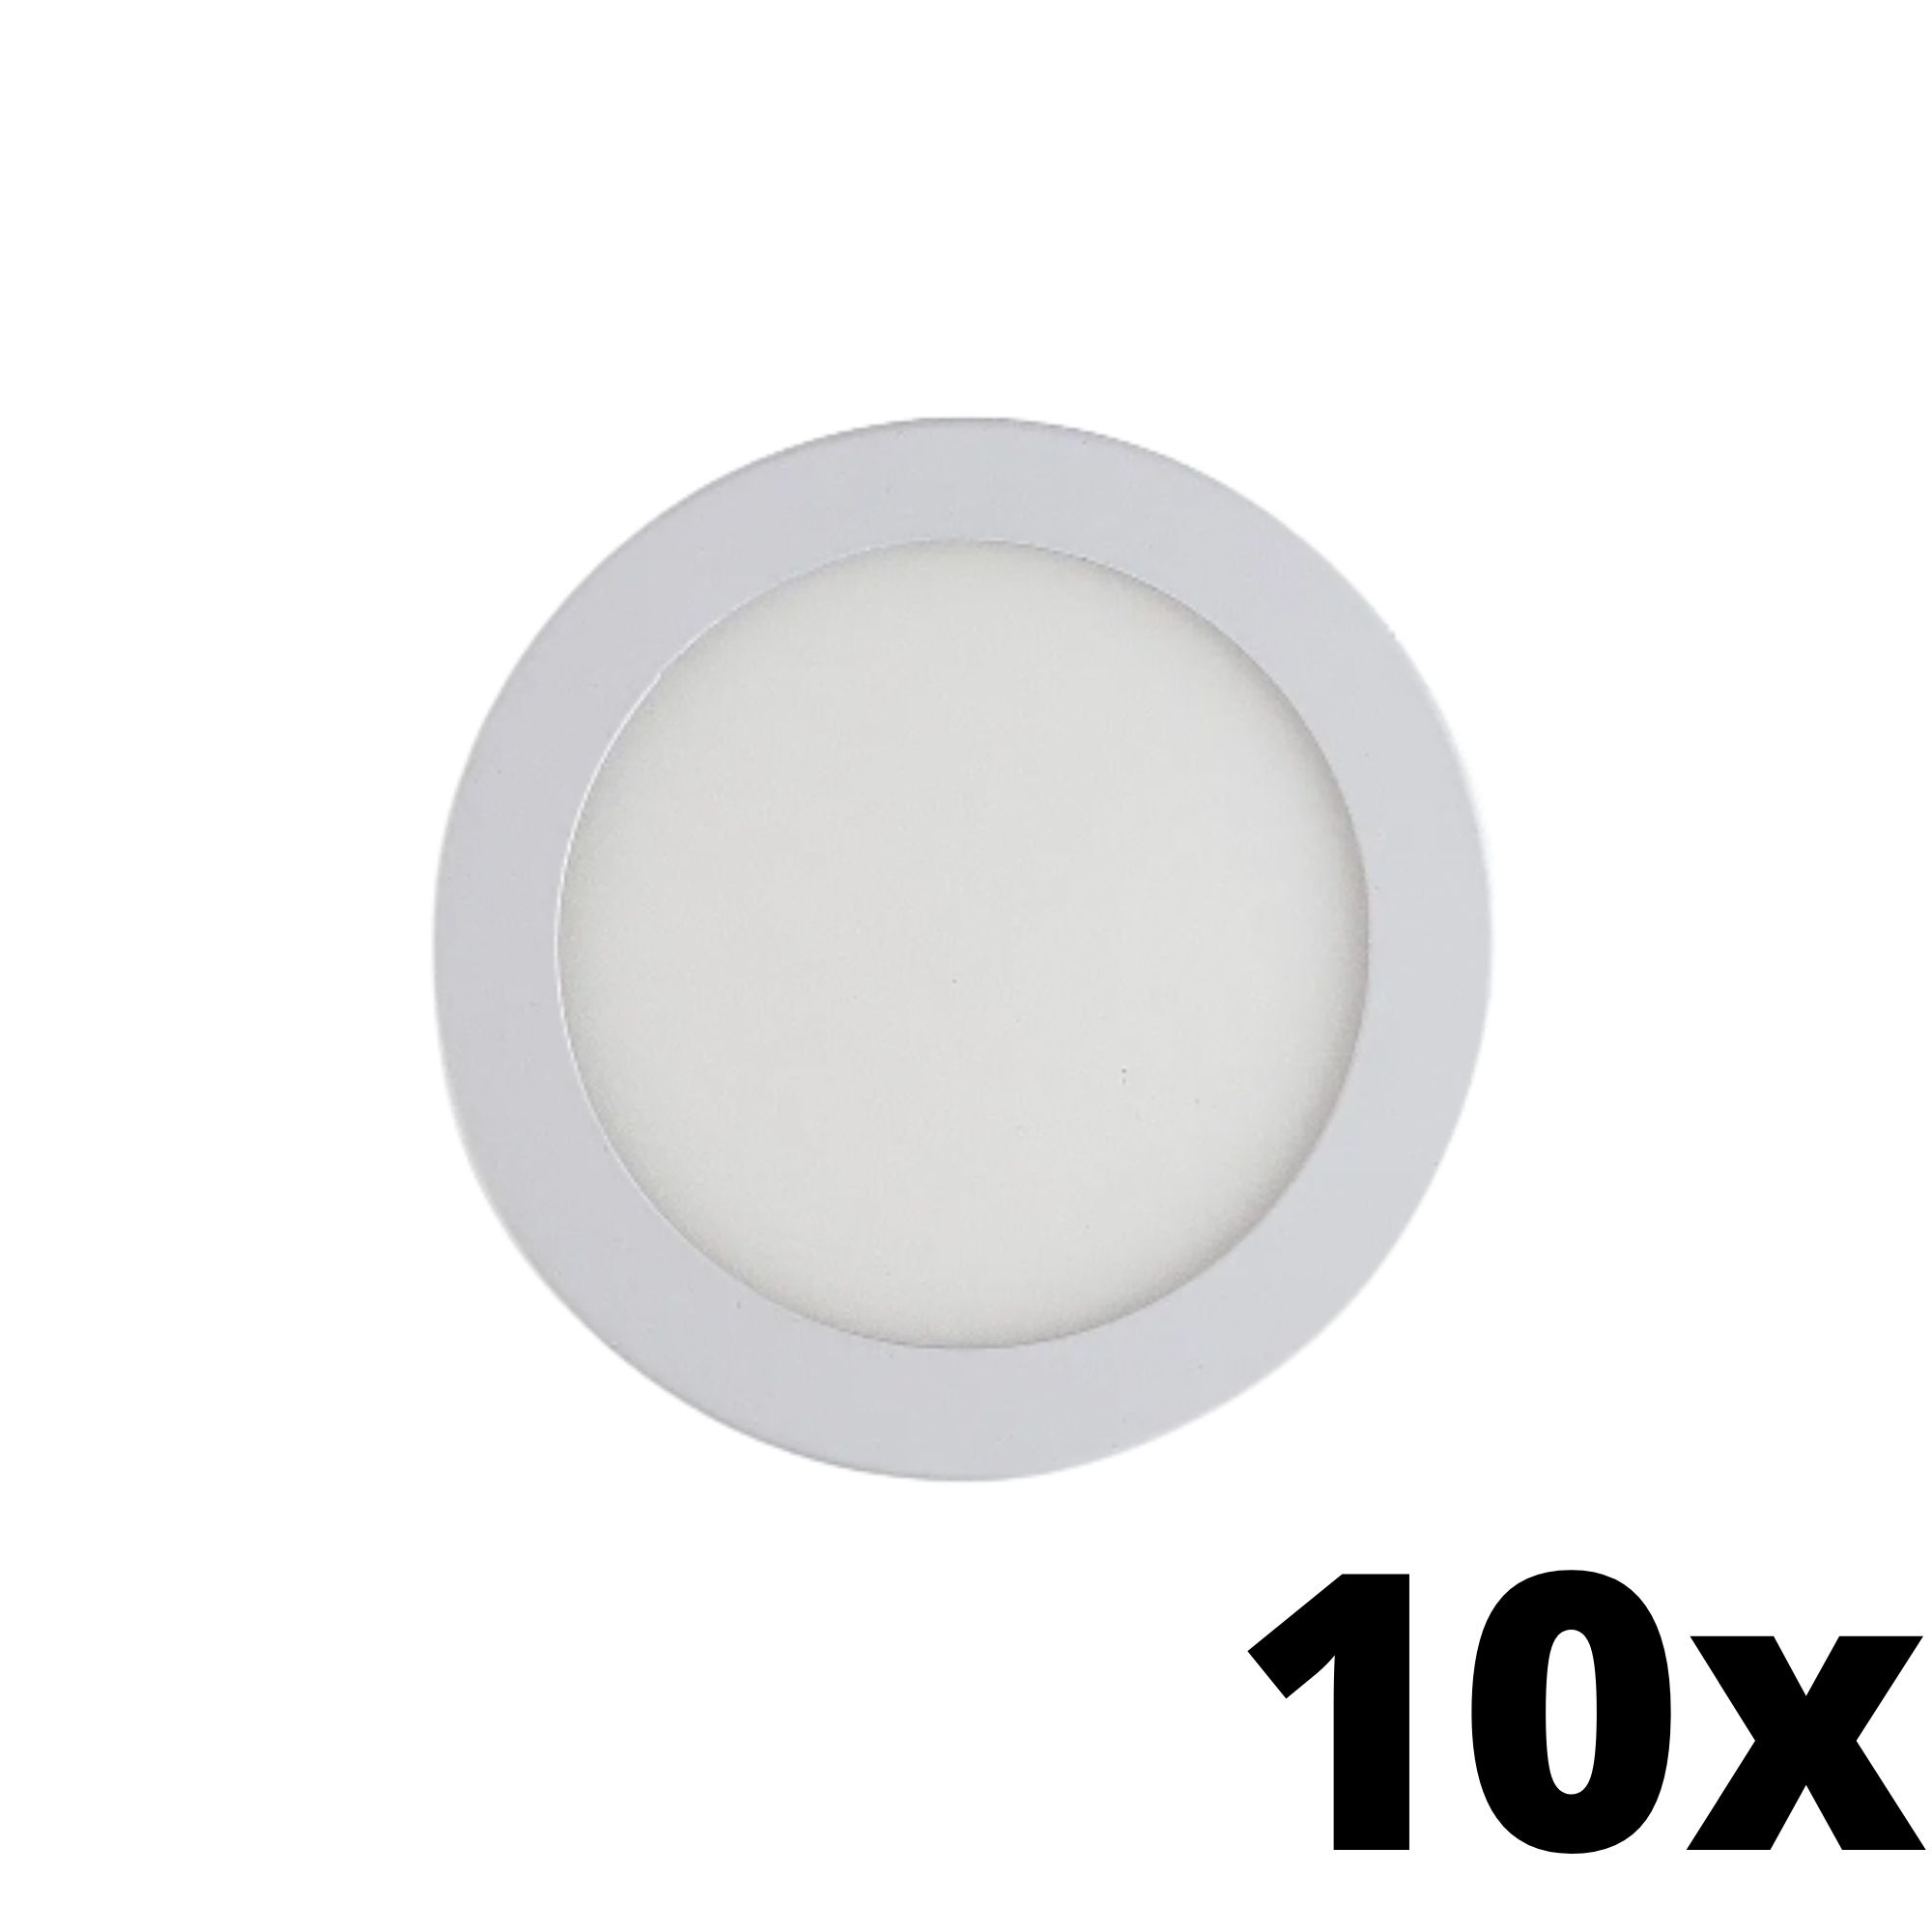 Kit 10 und Painel de Led Embutir 12w Redondo 6500k